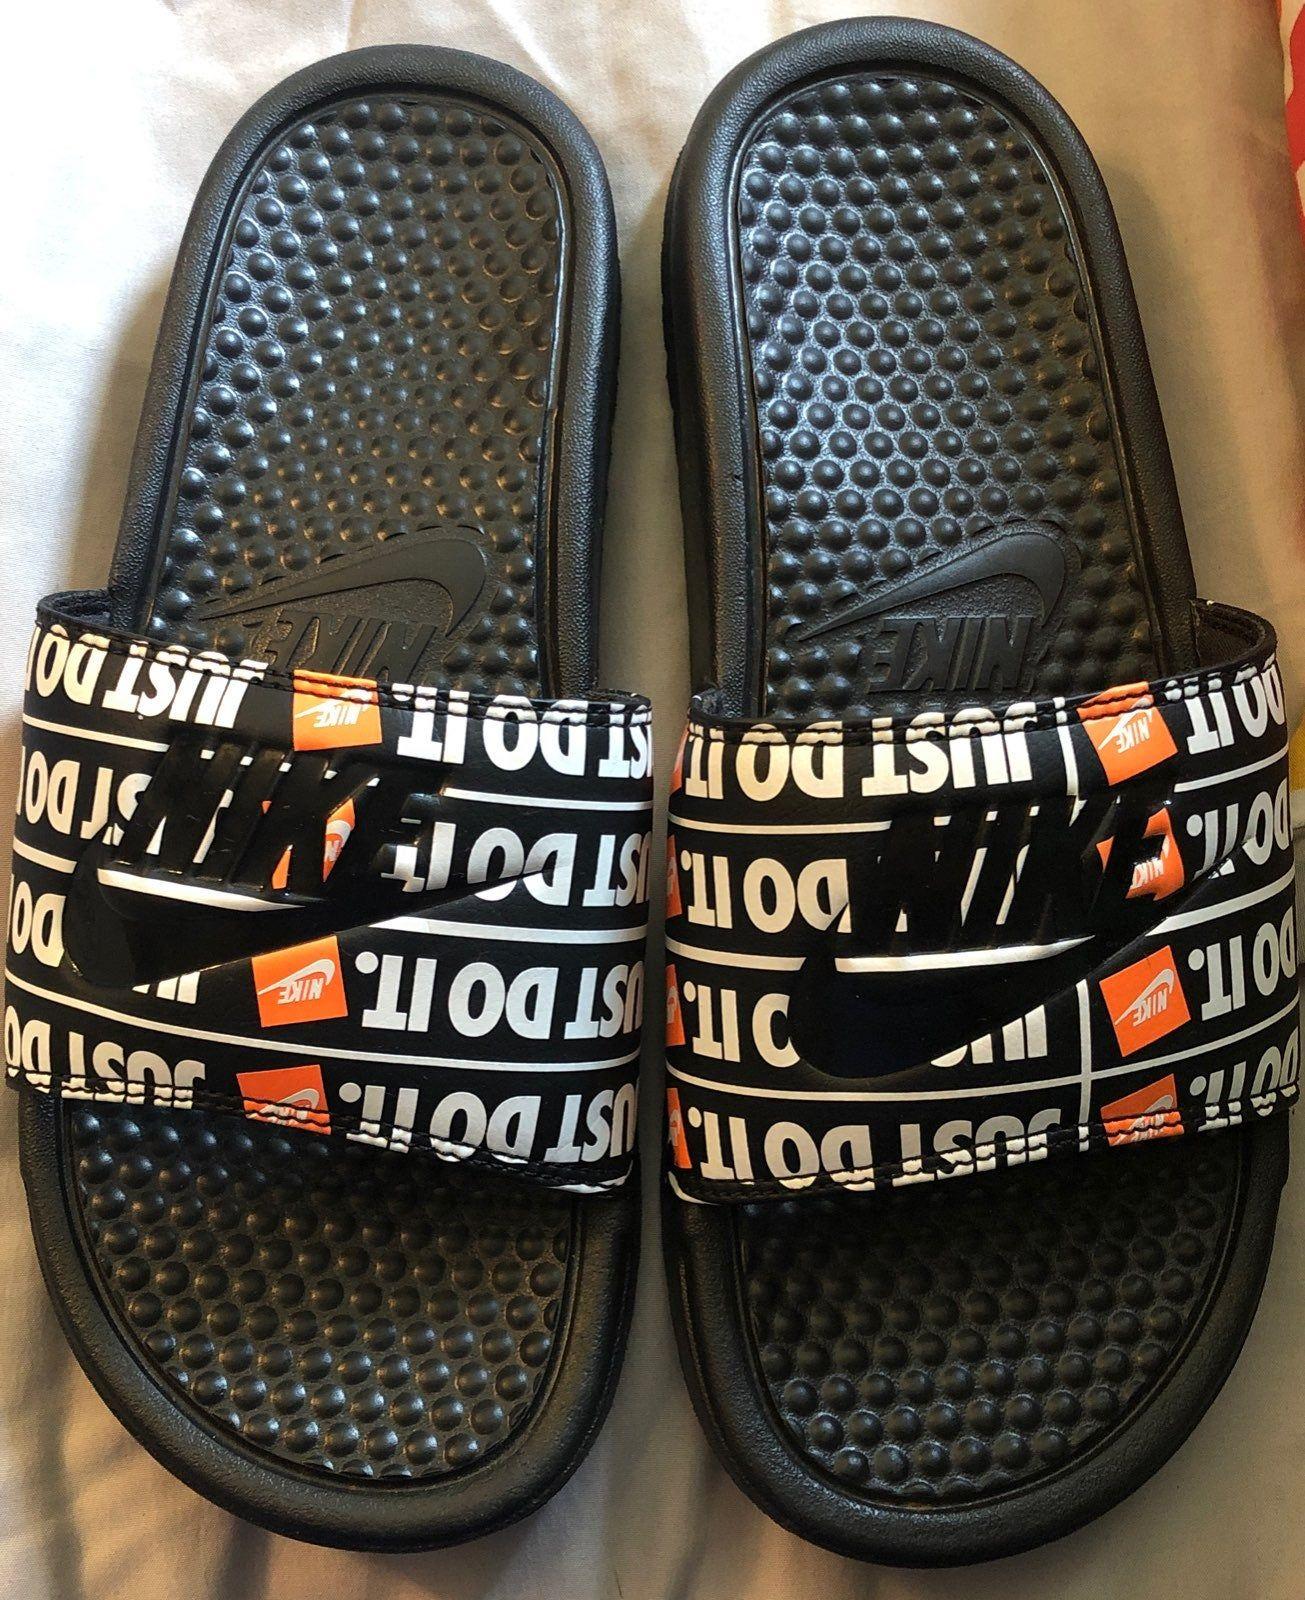 Hype shoes, Nike slides, Nike sandals